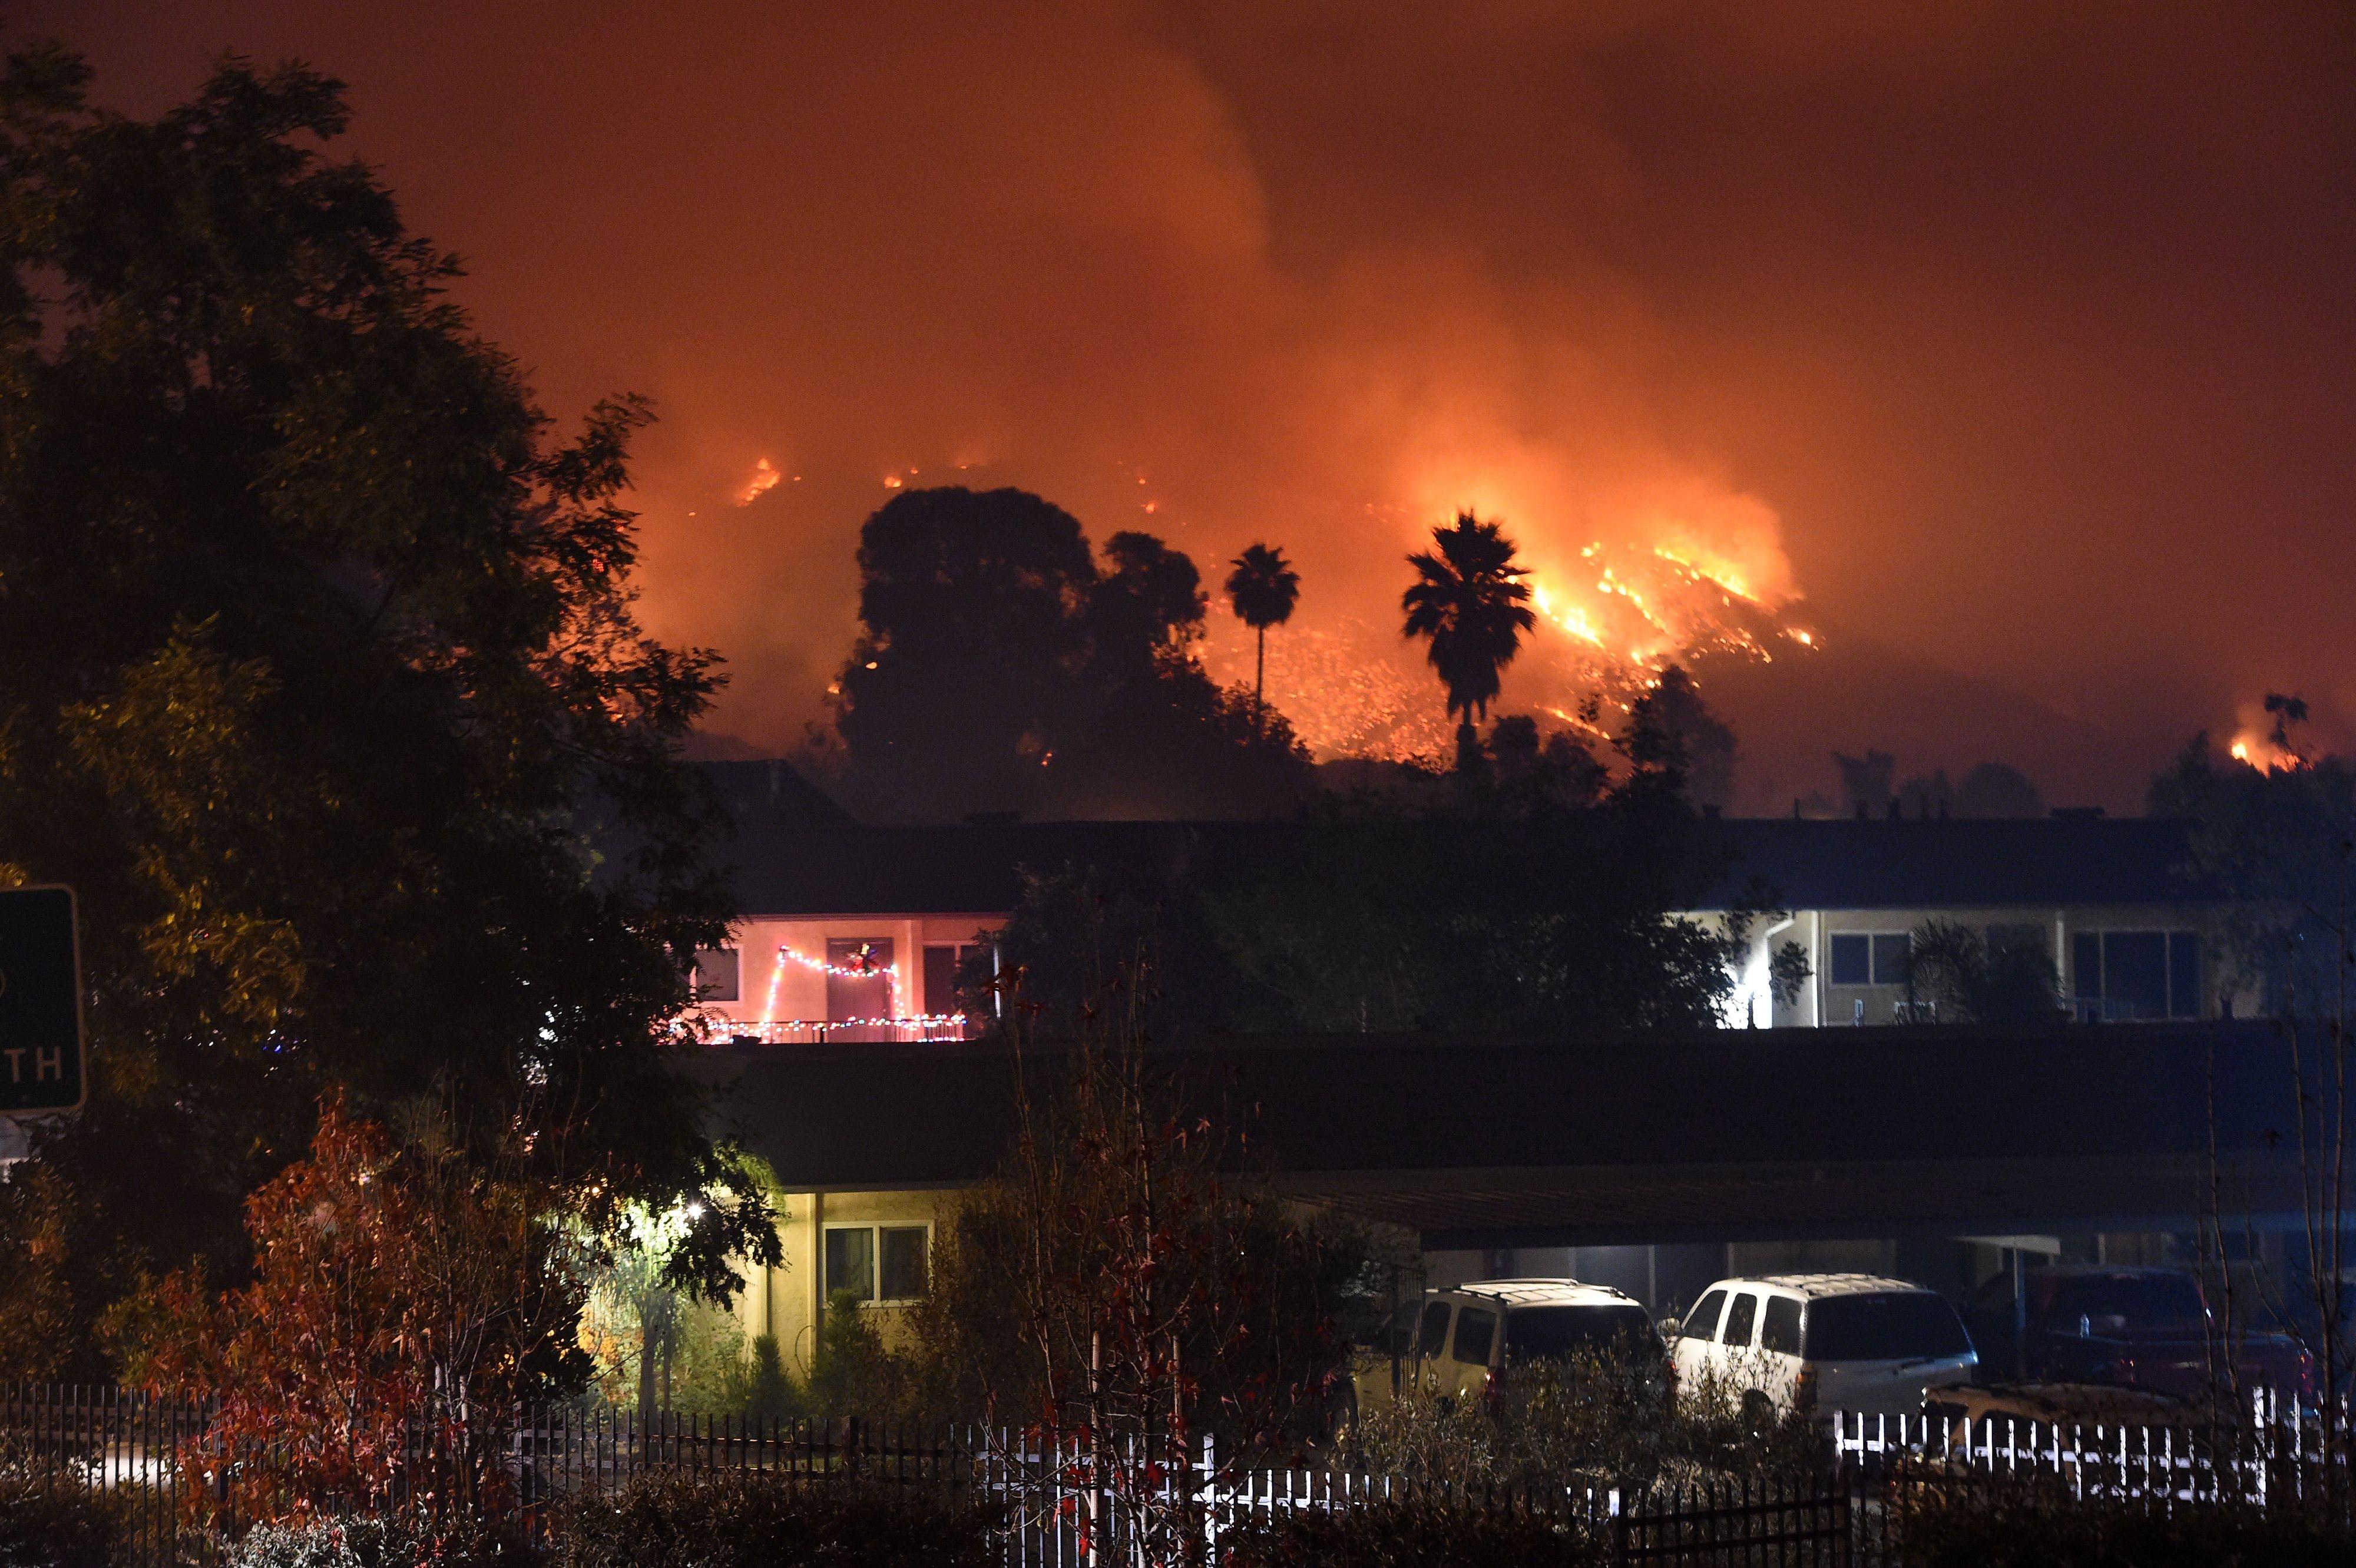 Ventura Fire Satellite >> LA Blames Wildfire on Homeless, Ignoring Larger Factors